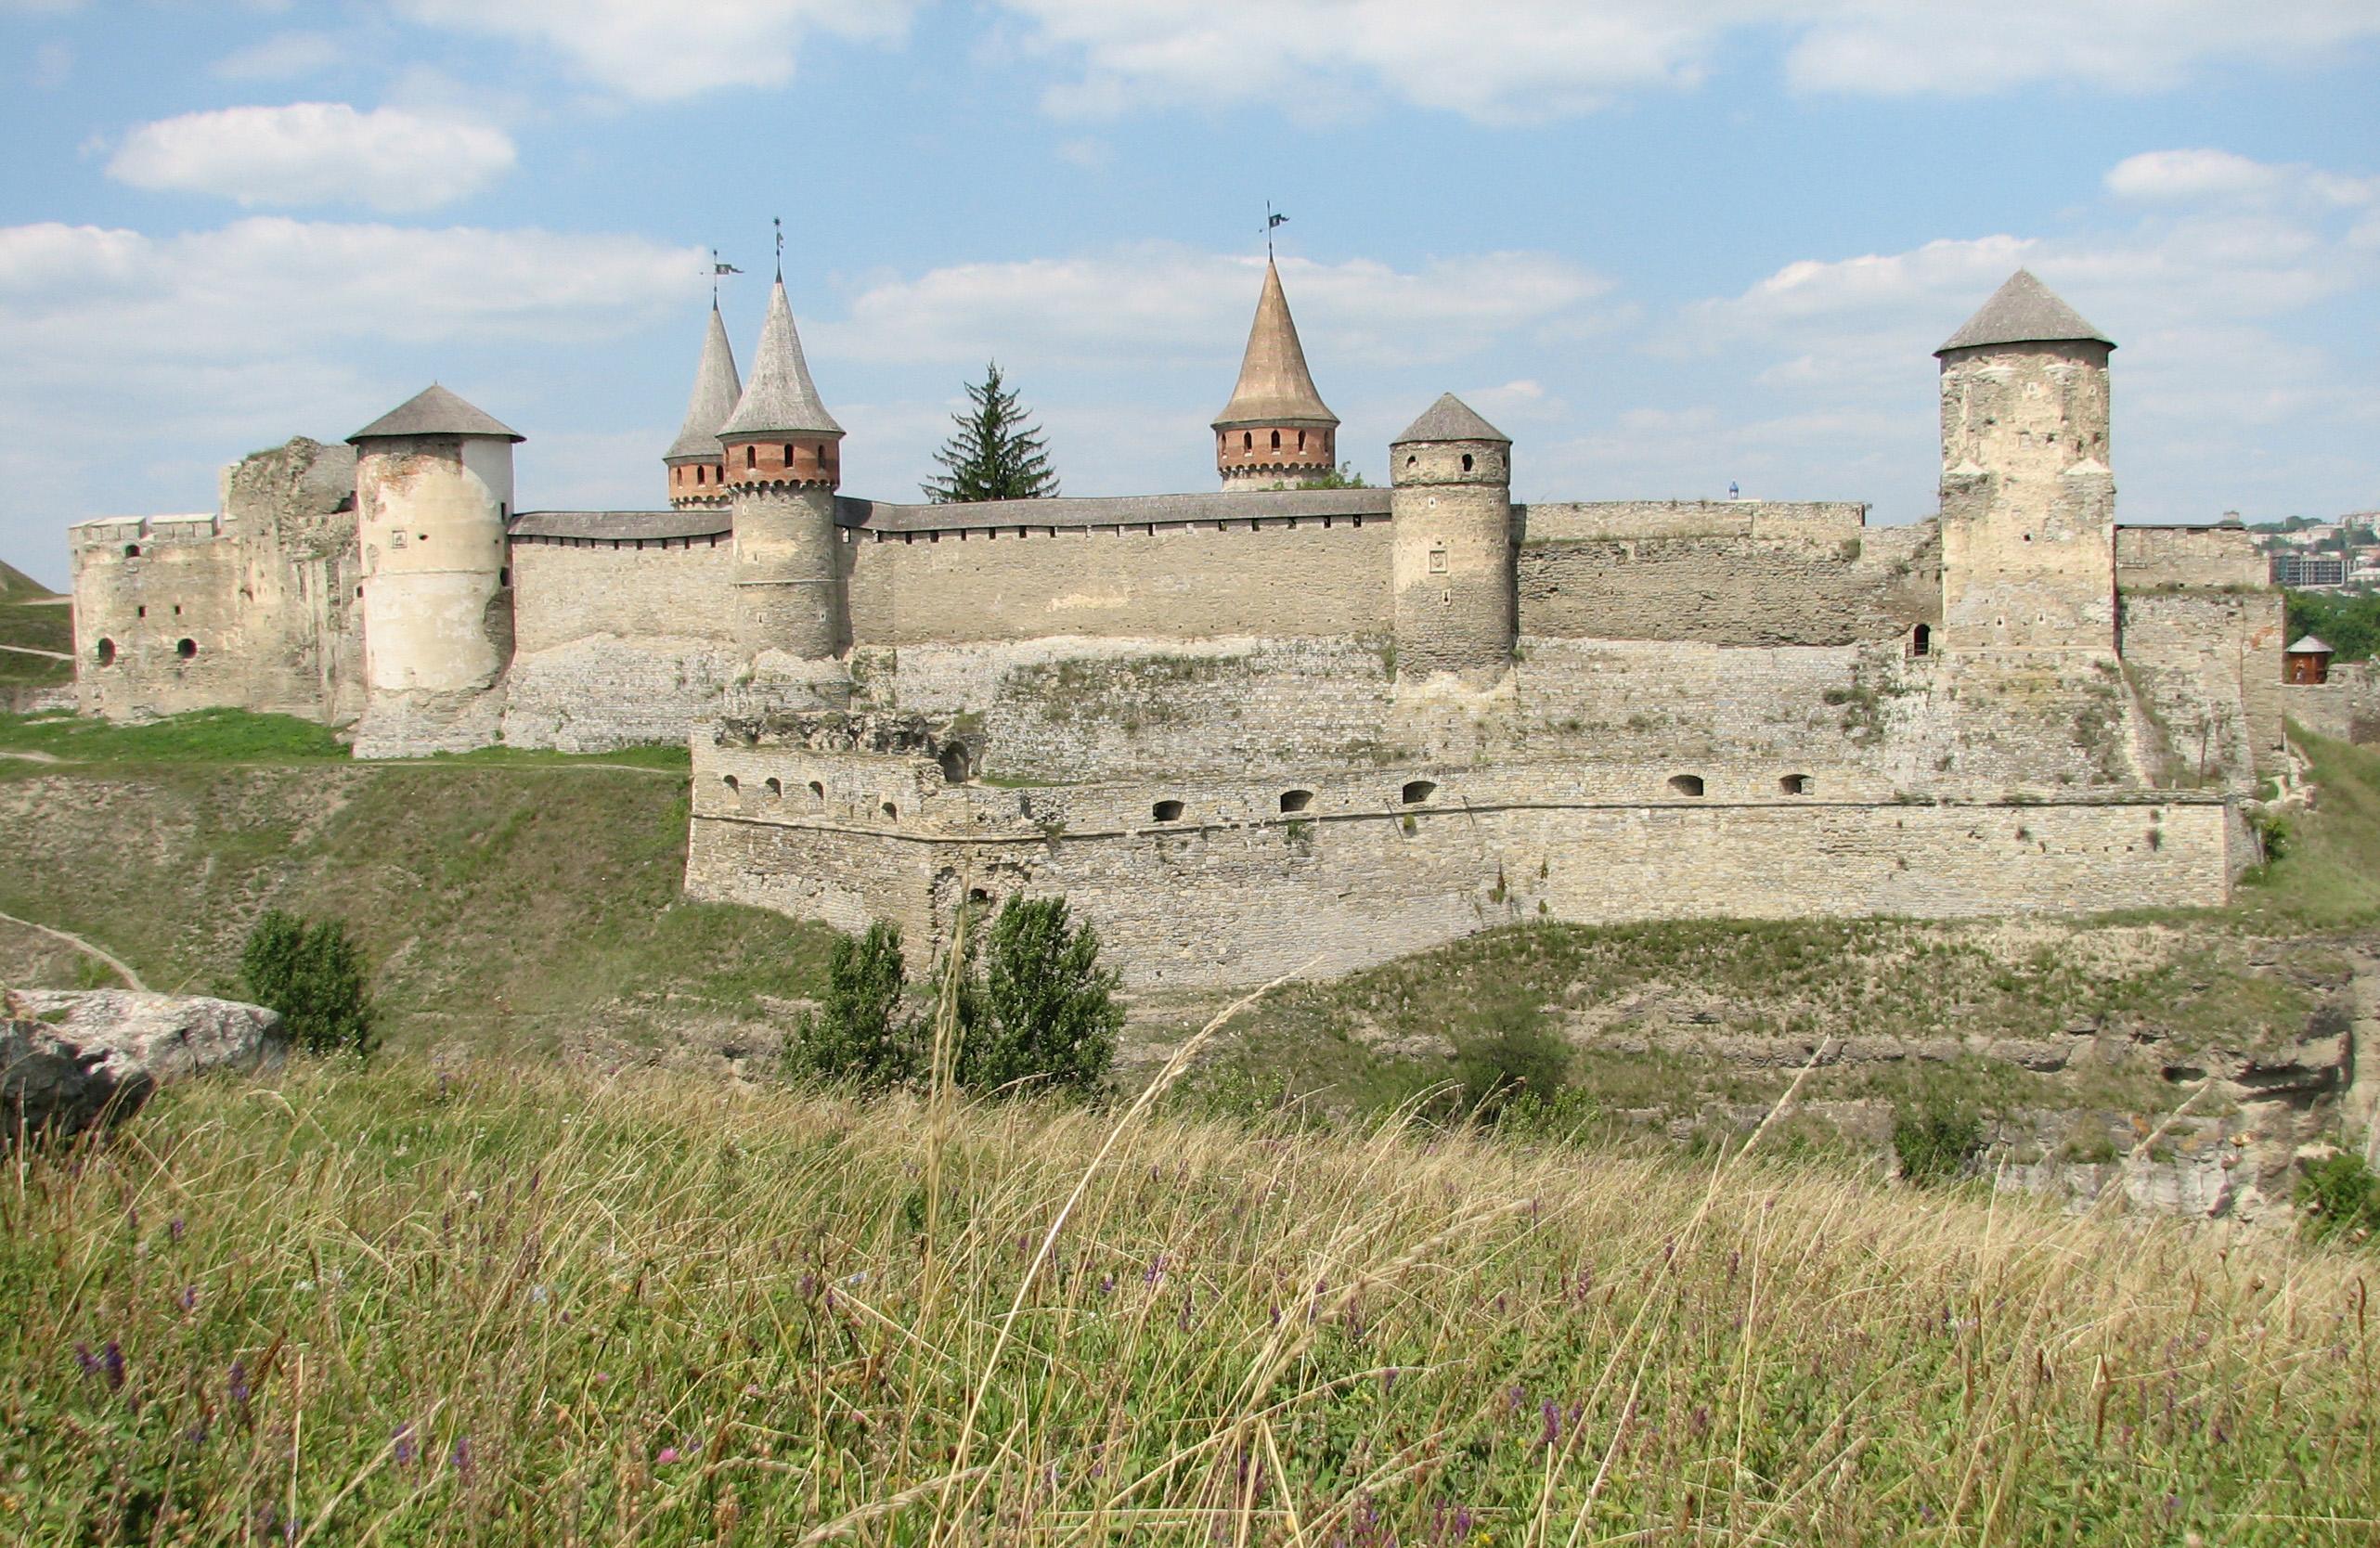 Kamianets-Podilskyi Castle in Ukraine.